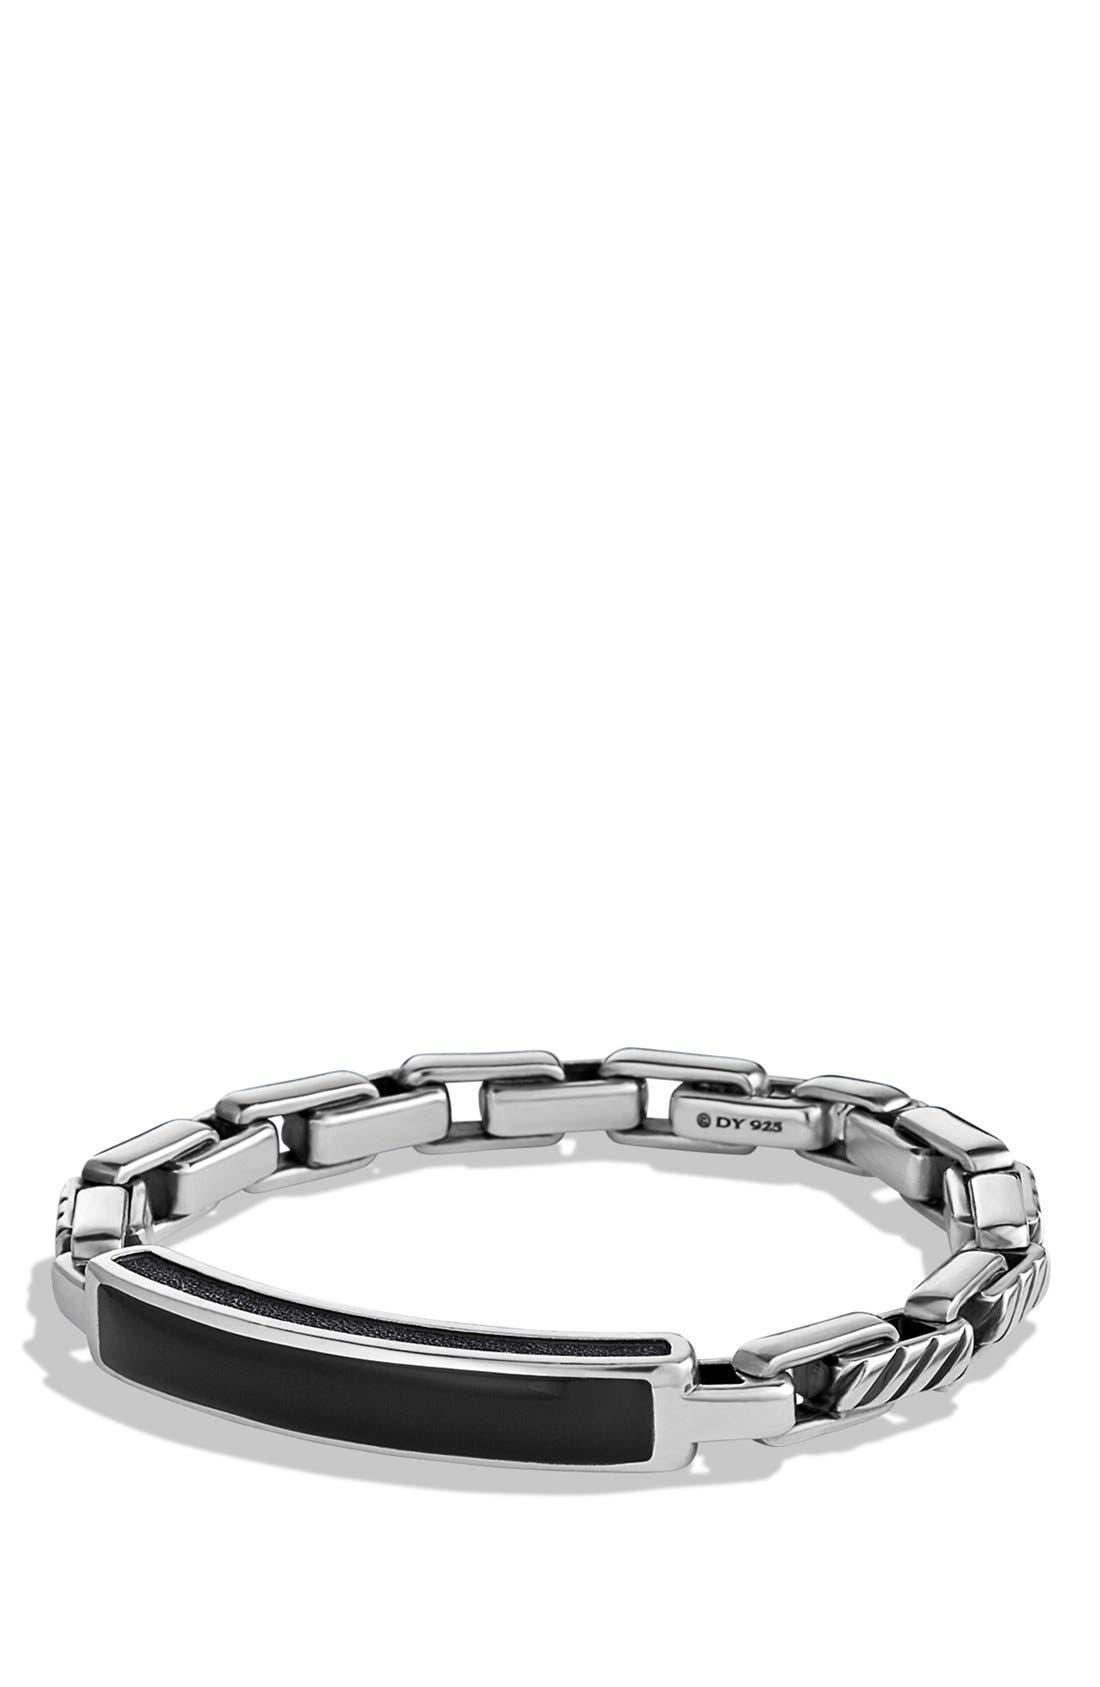 ' Modern Cable' ID Bracelet,                         Main,                         color, Black Onyx